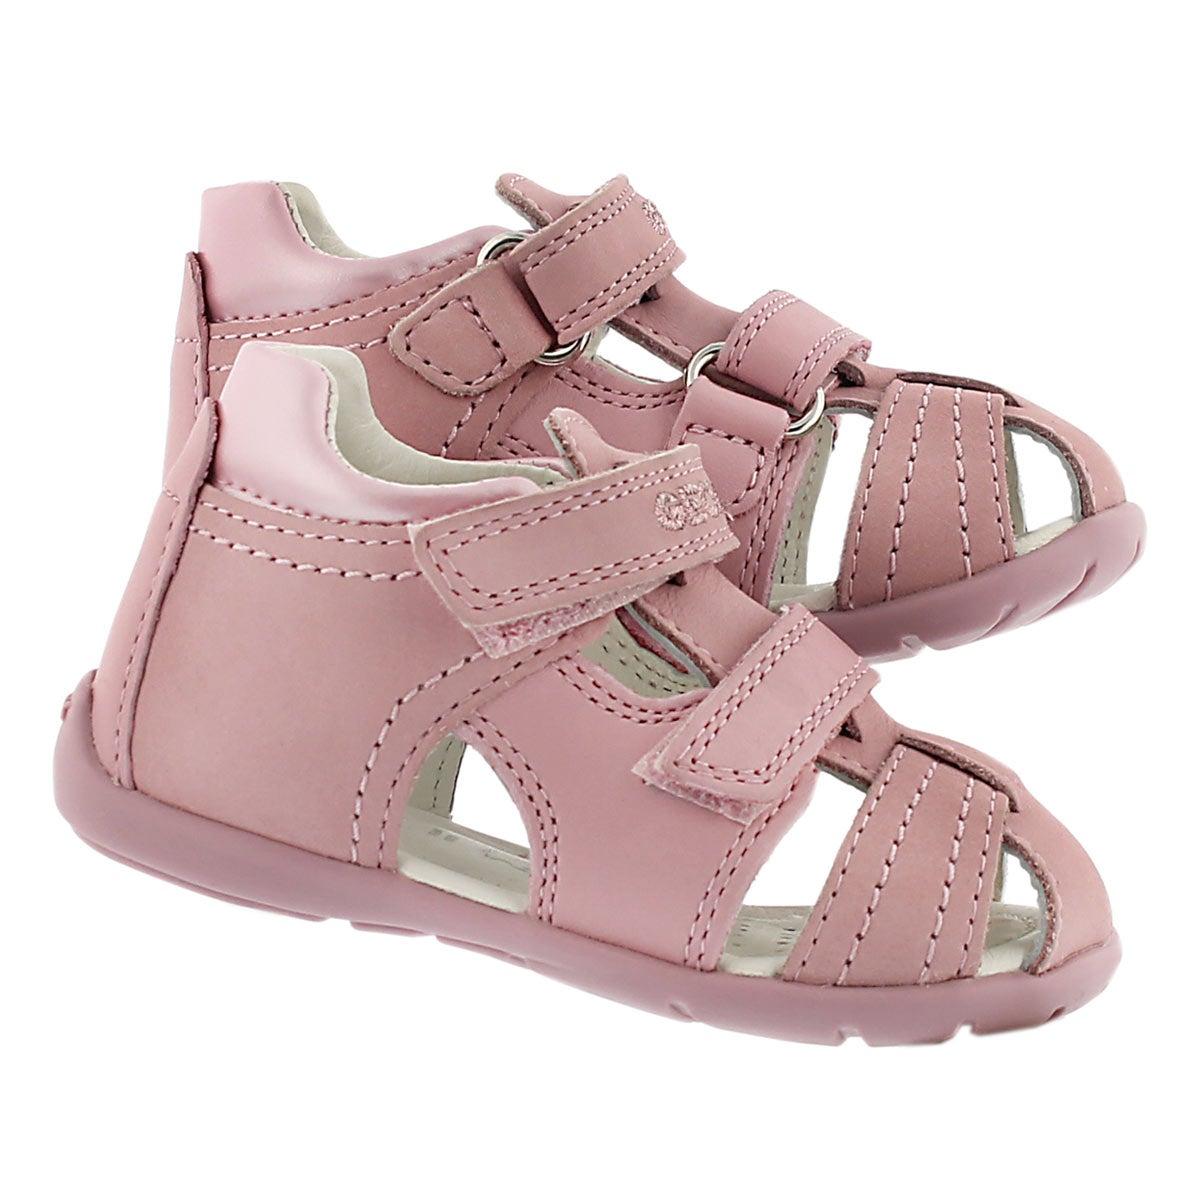 Infs Kaytan pink fisherman sandal